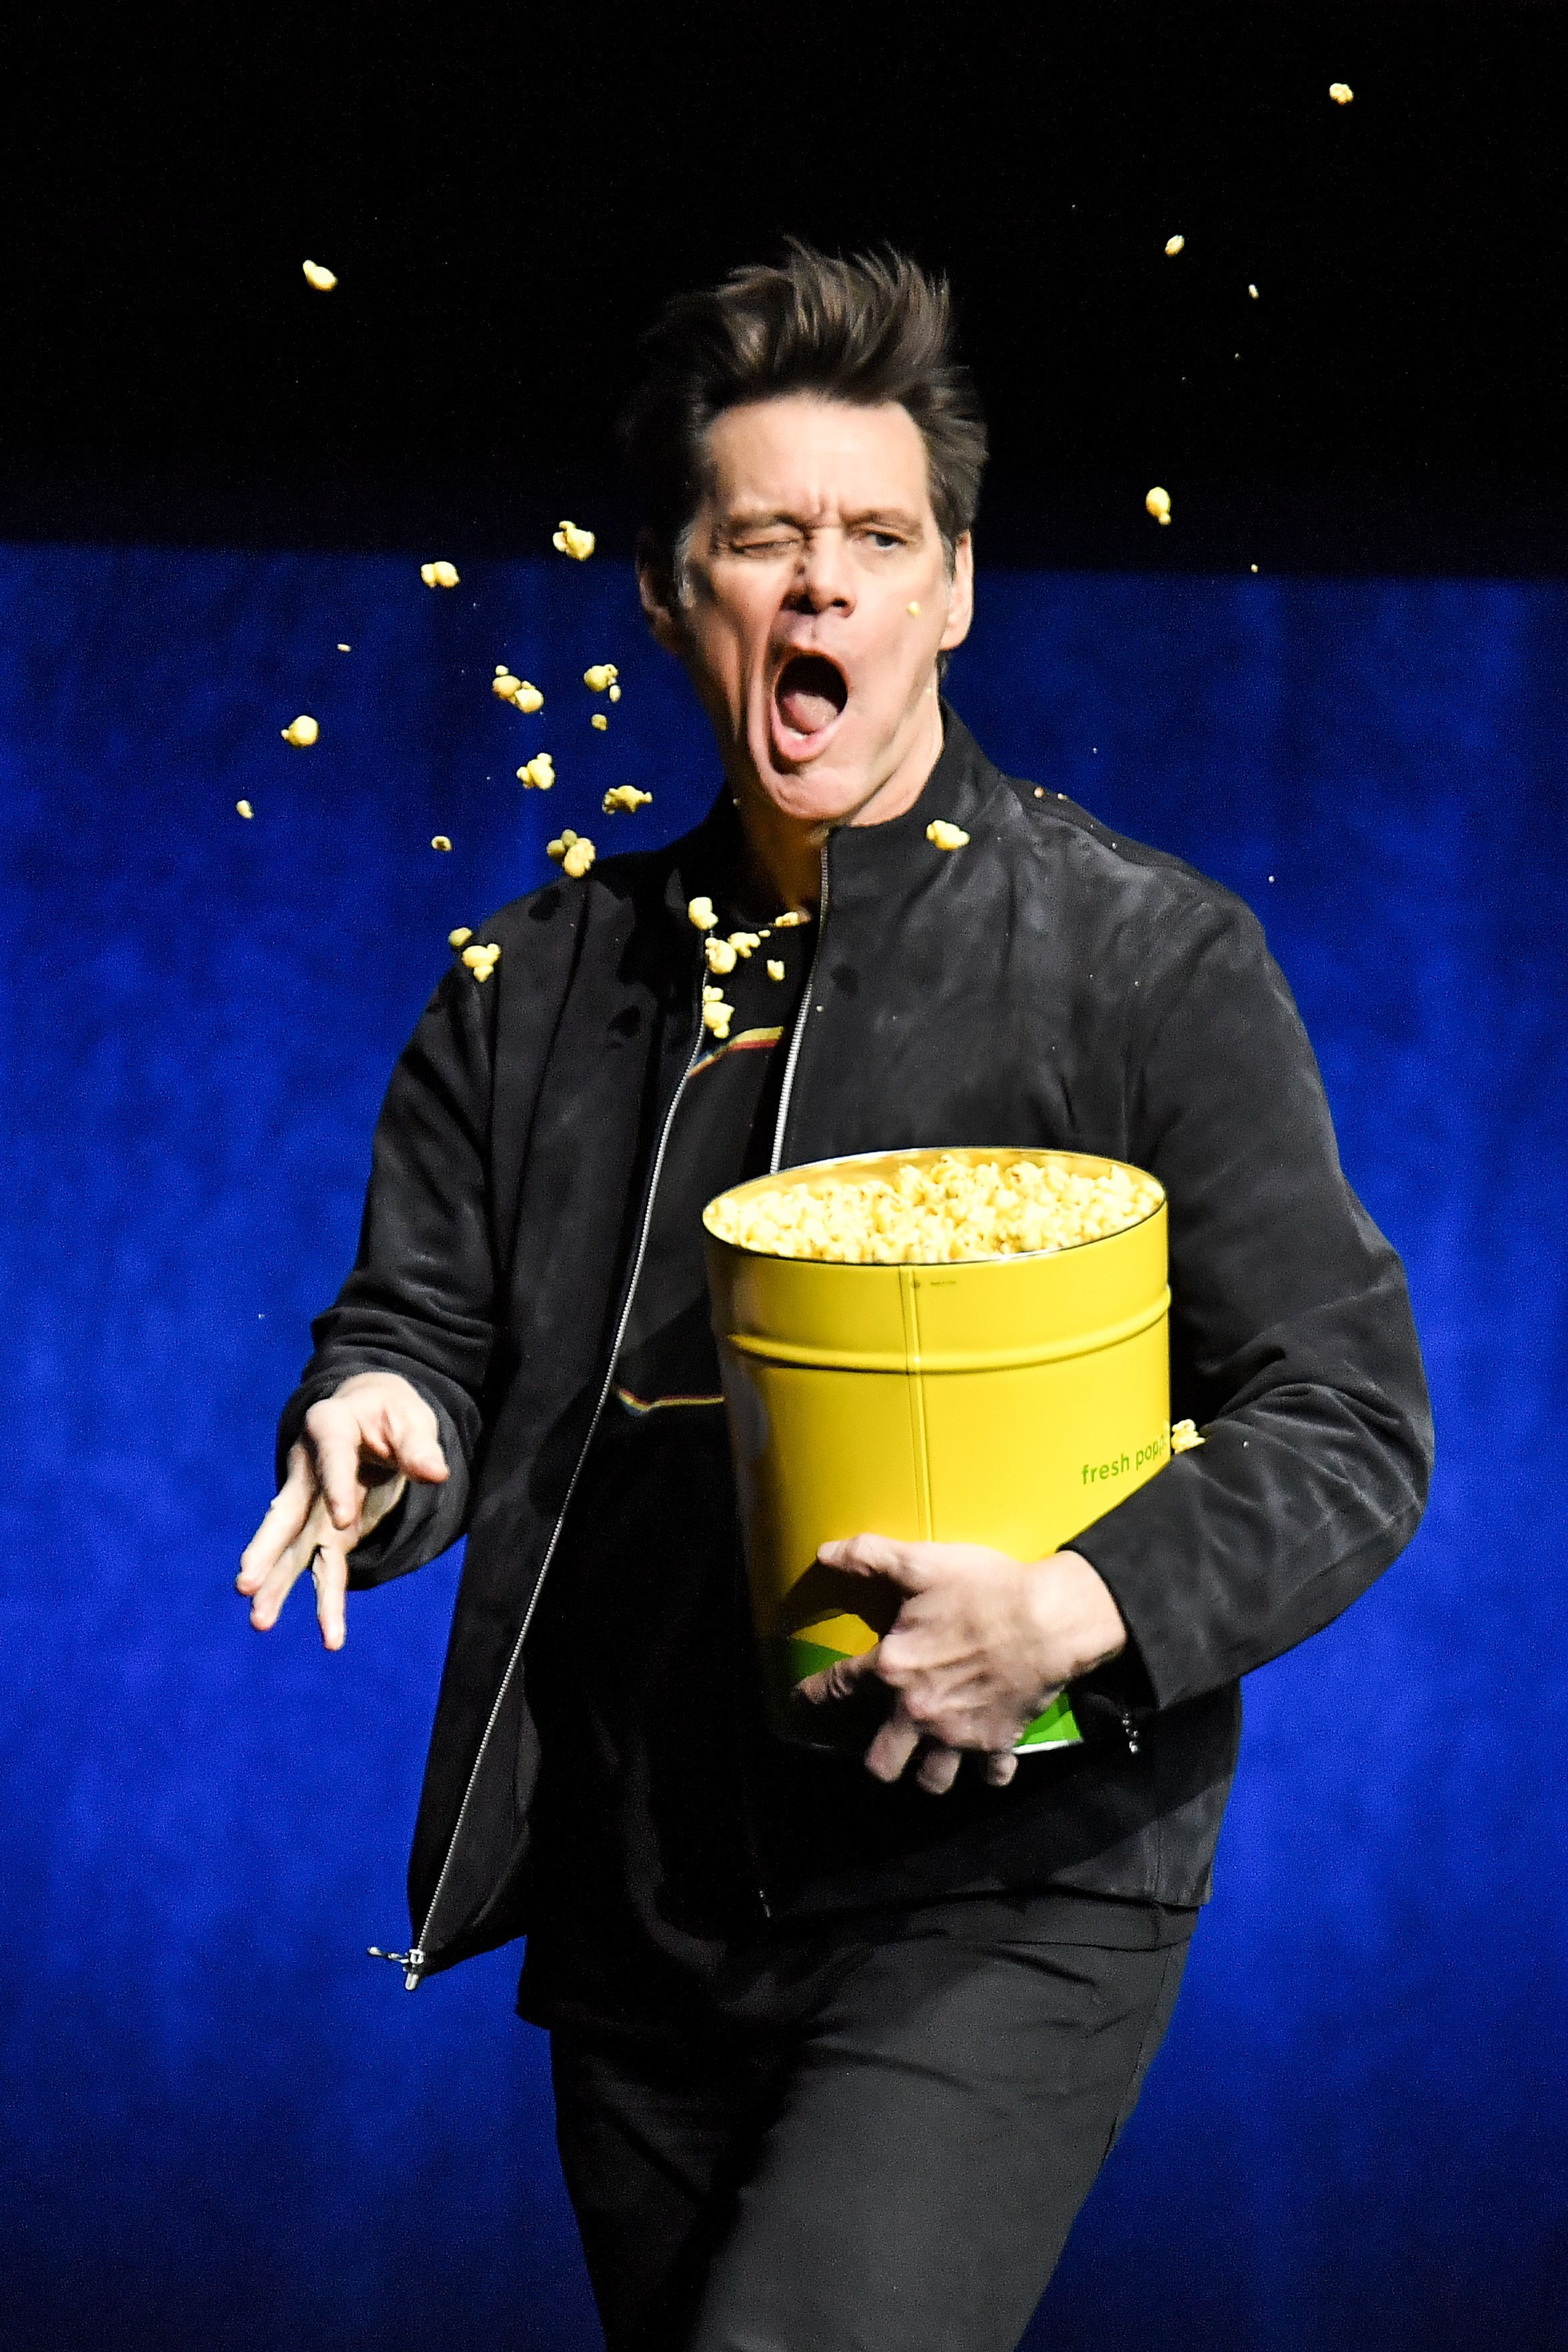 Jim Carrey attends CinemaCon in Las Vegas on April 4, 2019.